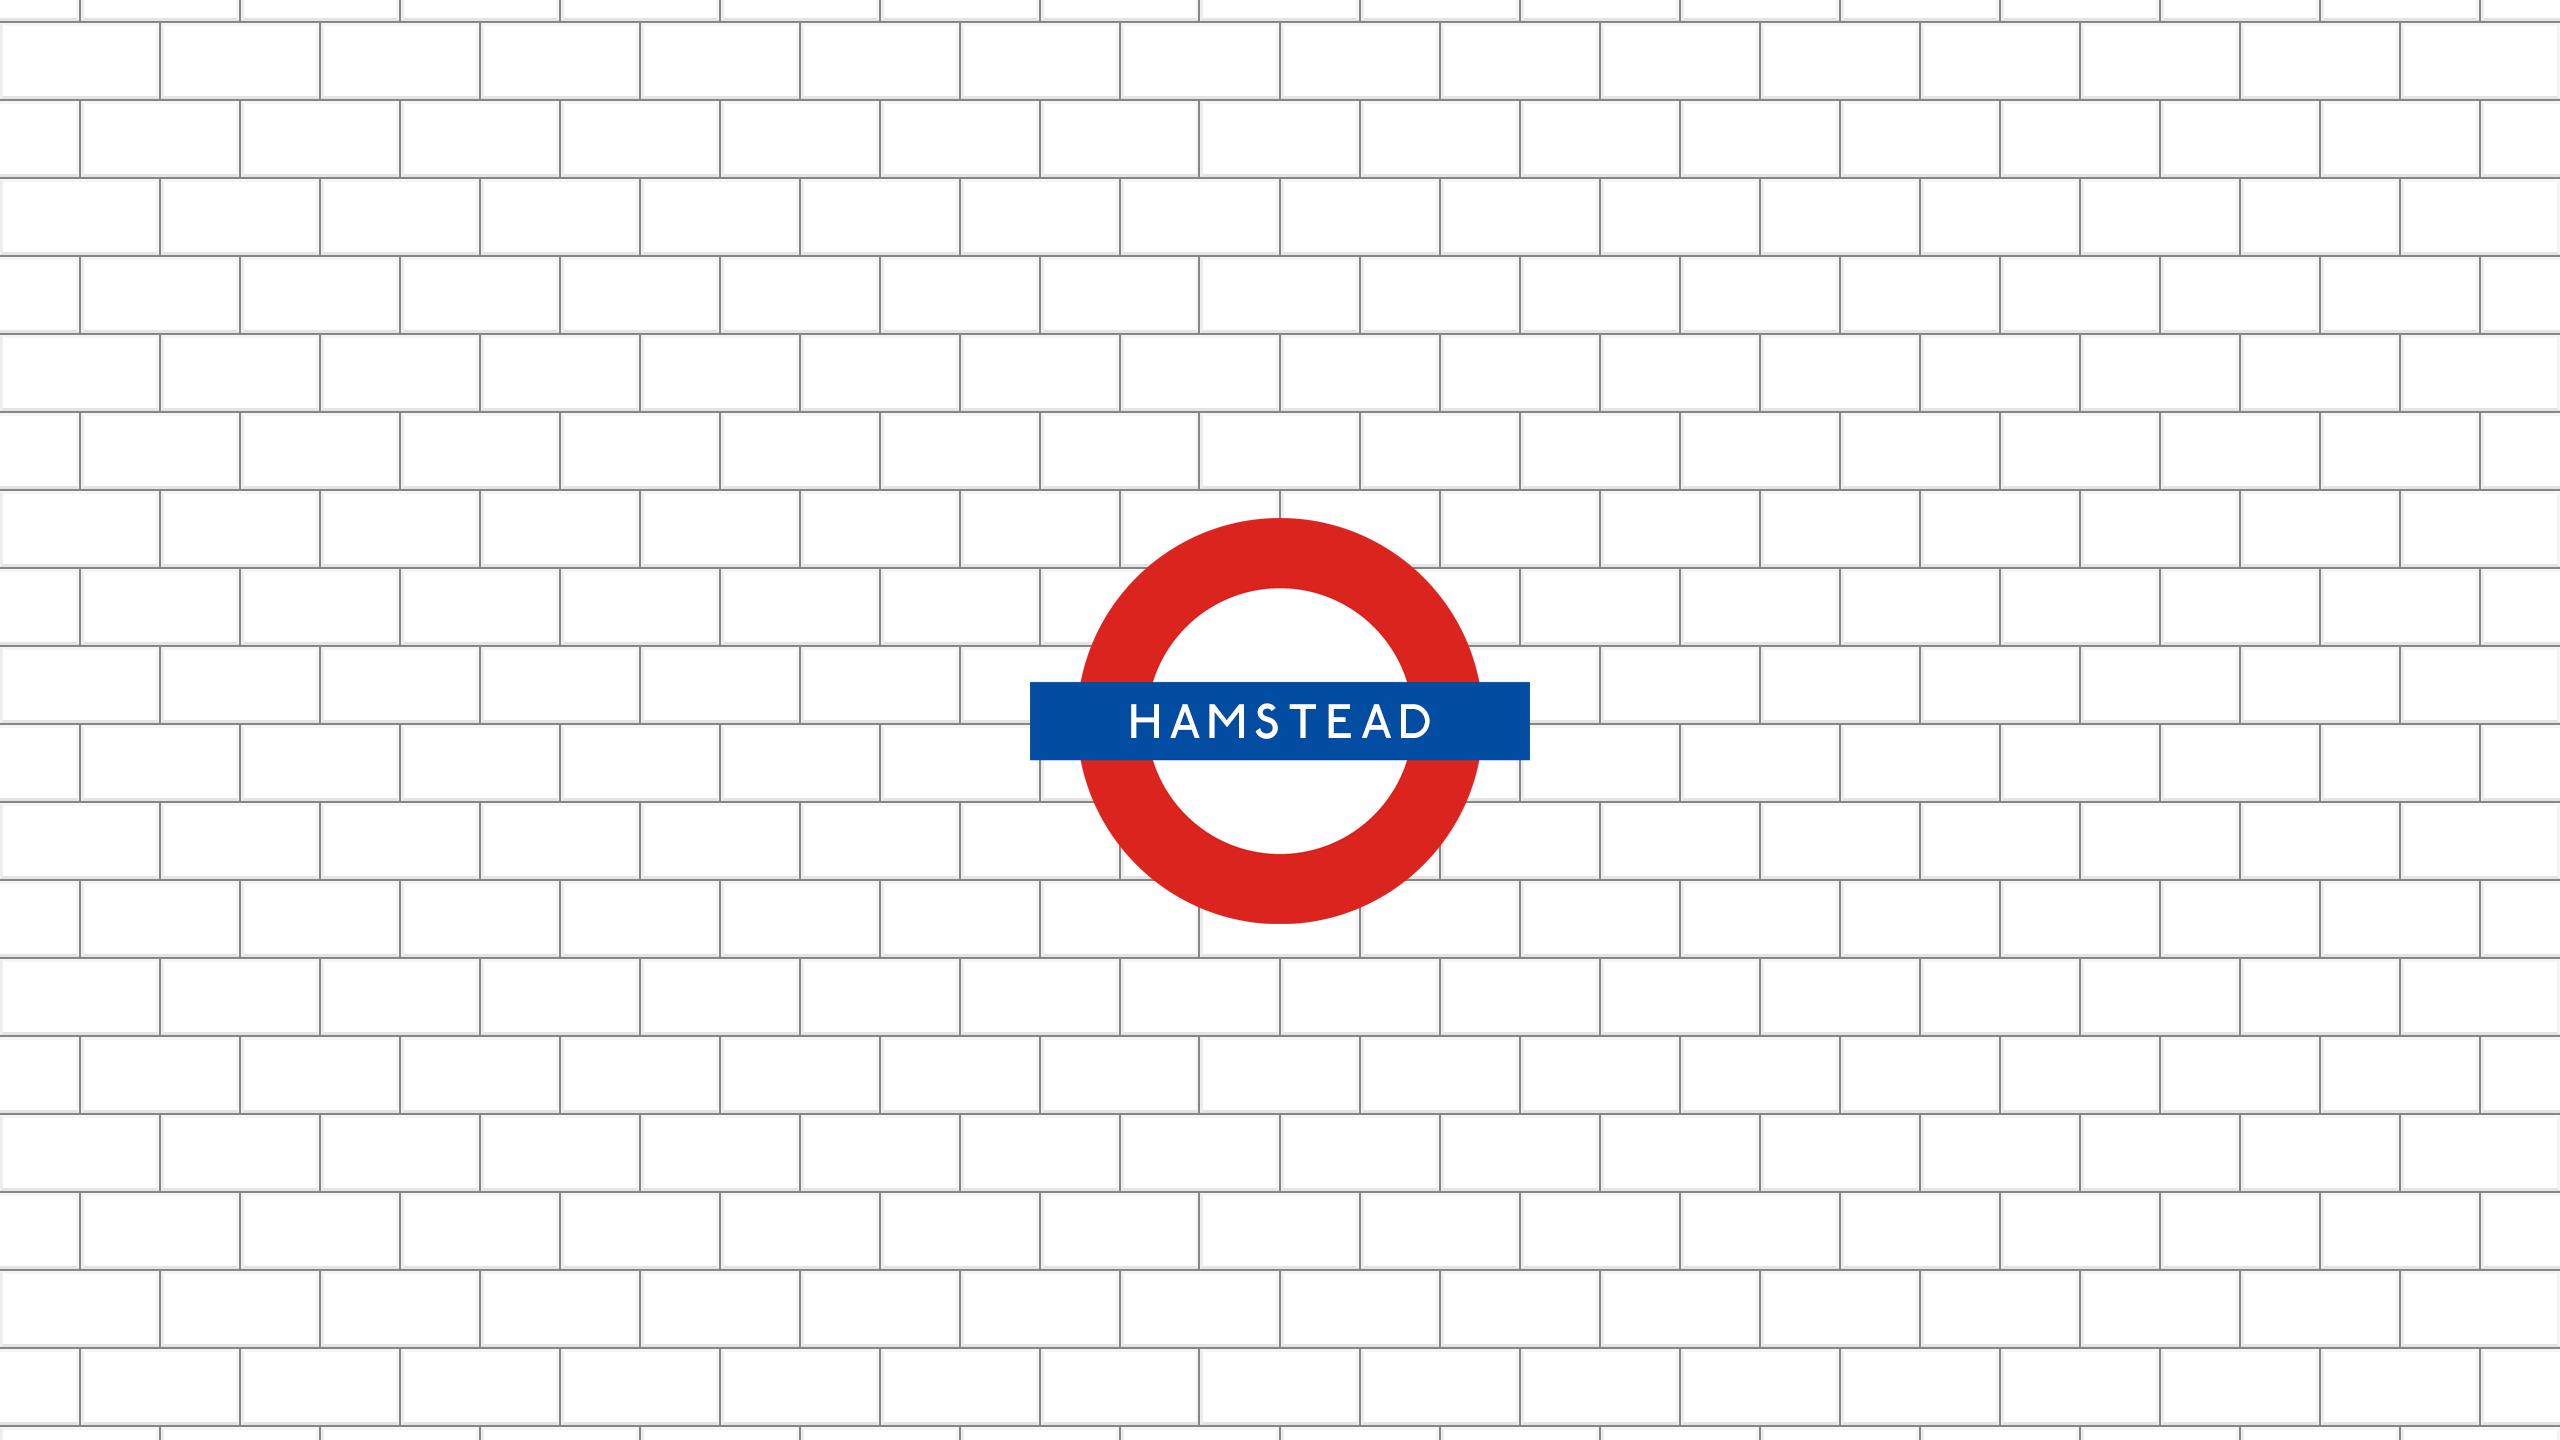 Hamstead